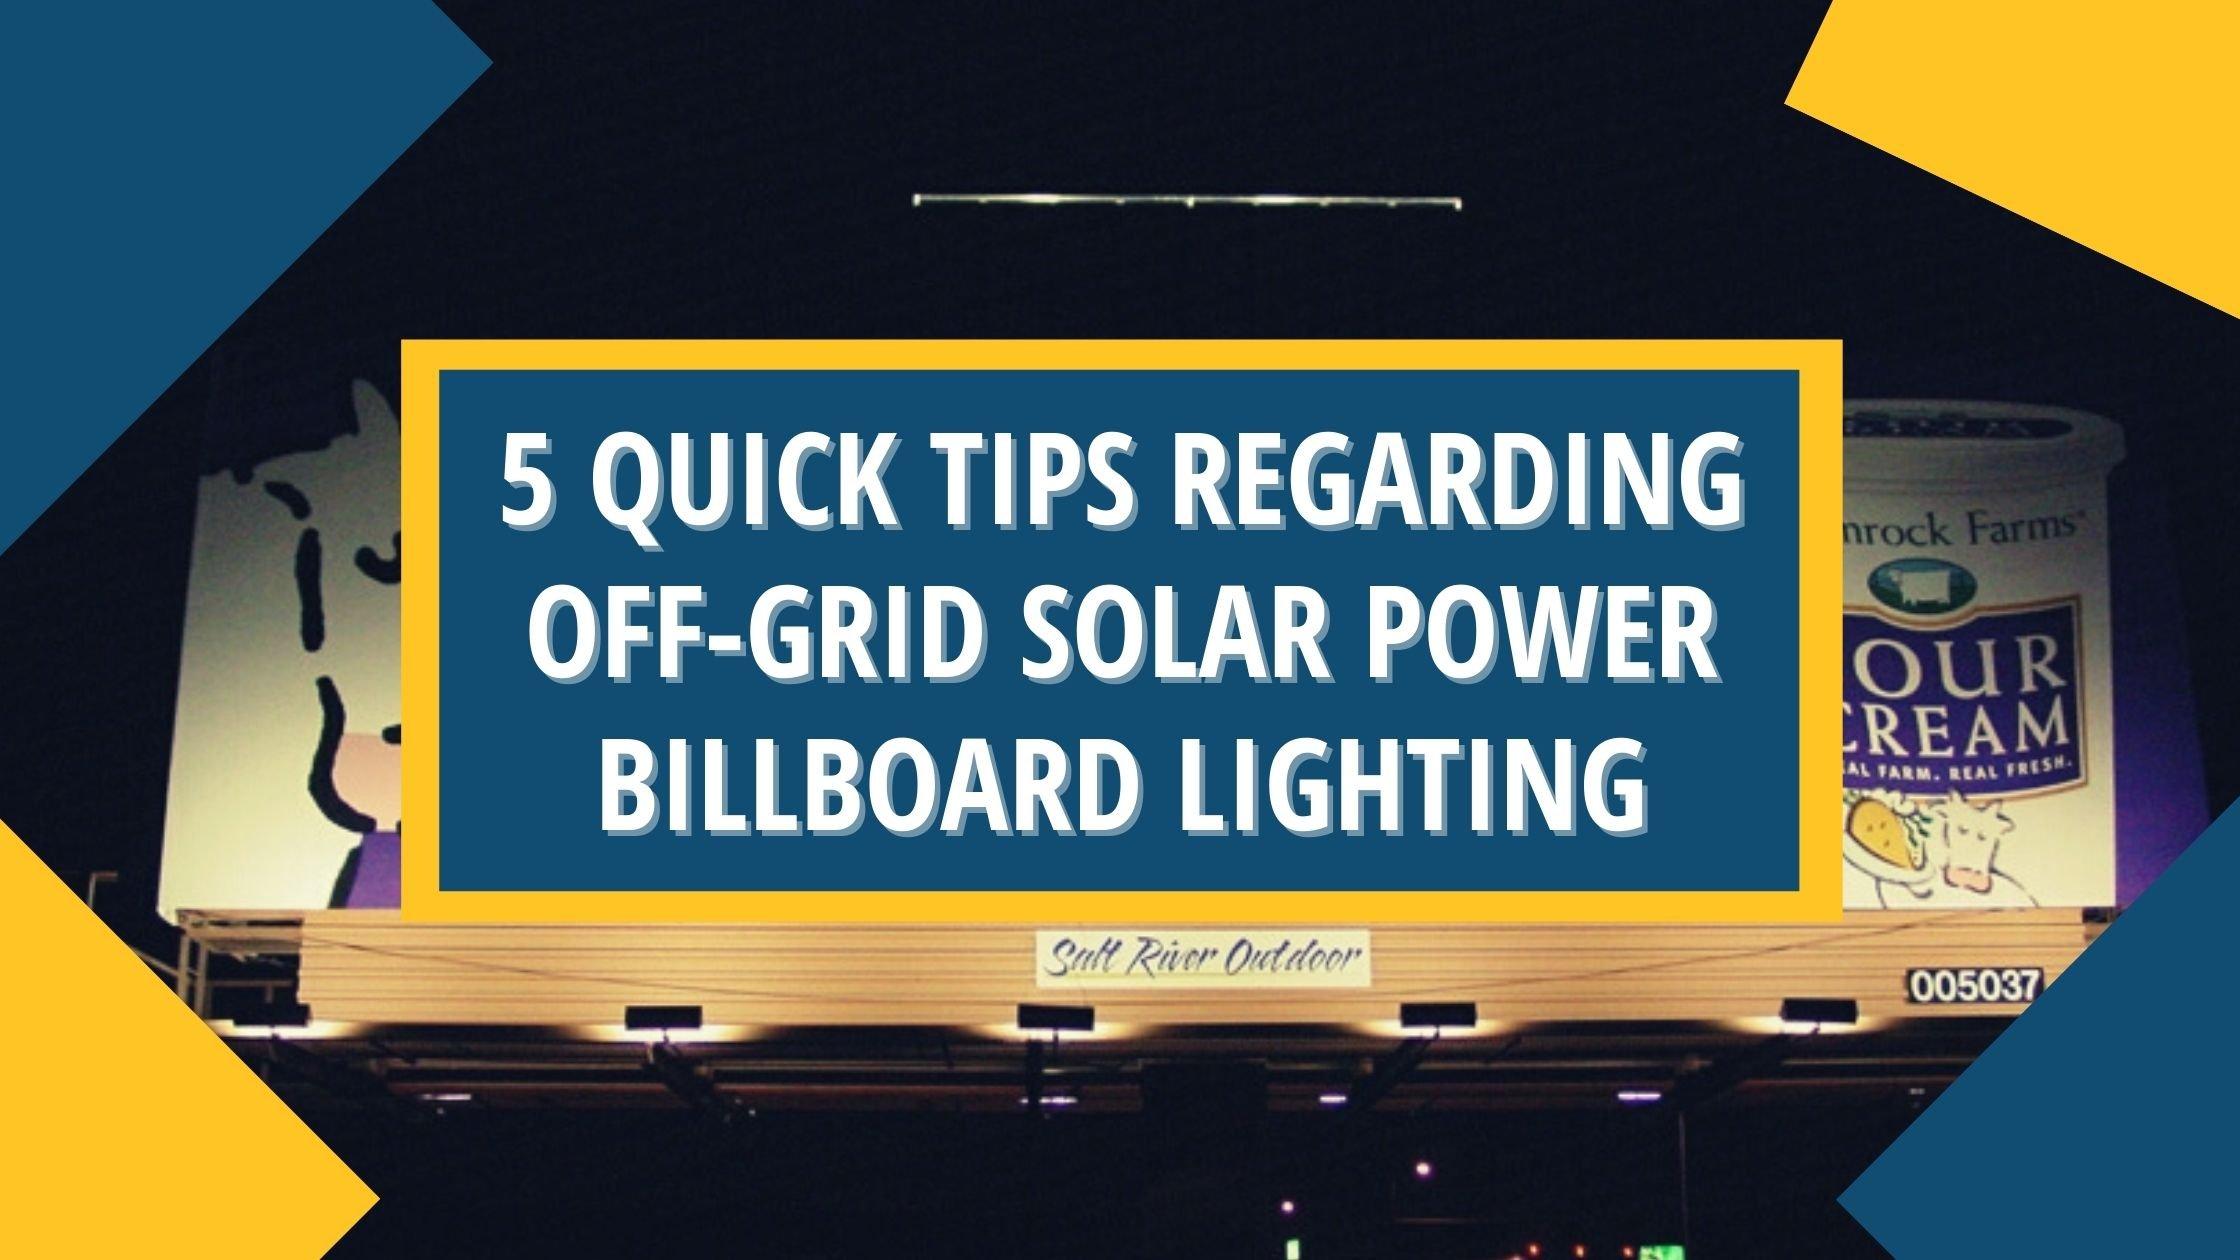 Off-Grid Solar Power Billboard Lighting